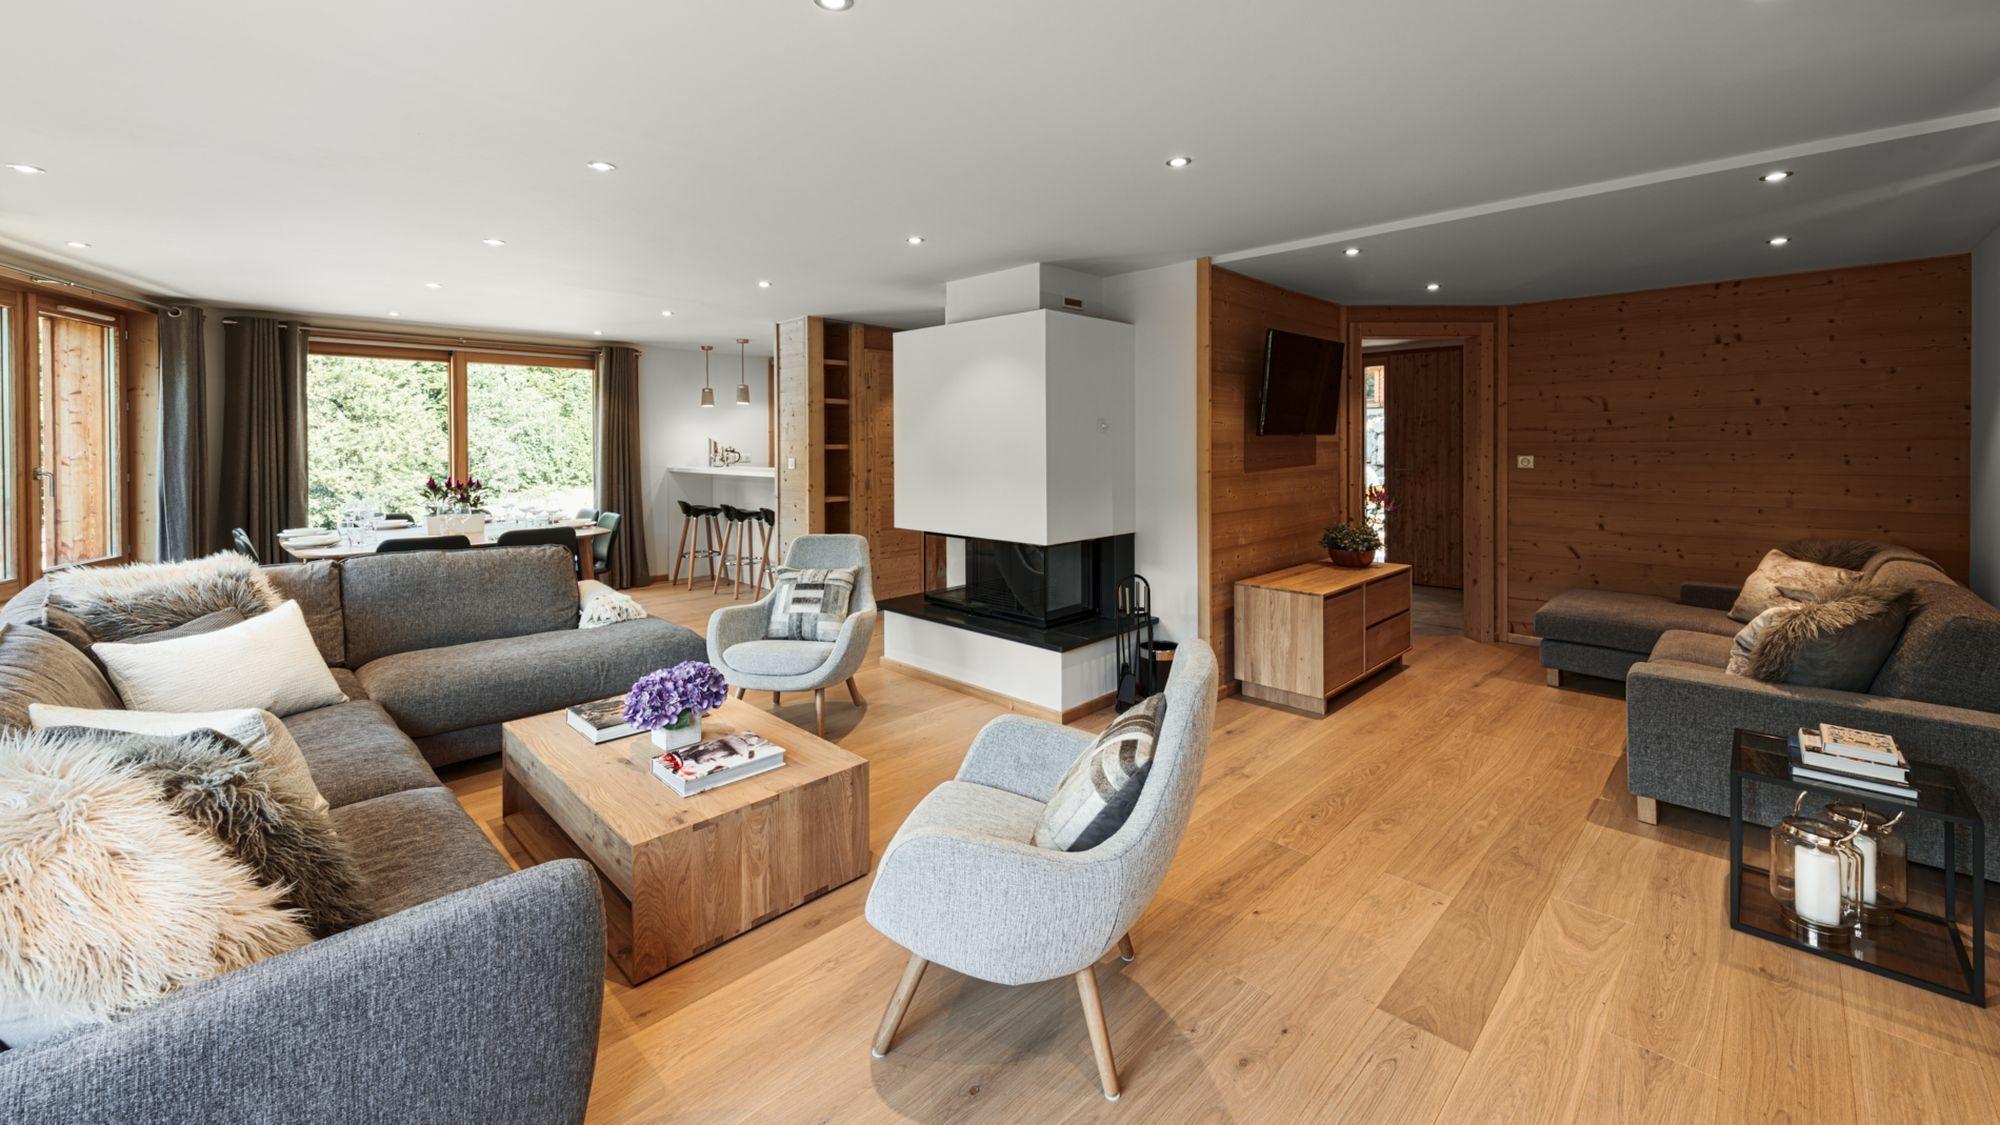 Lorne Accommodation in Morzine